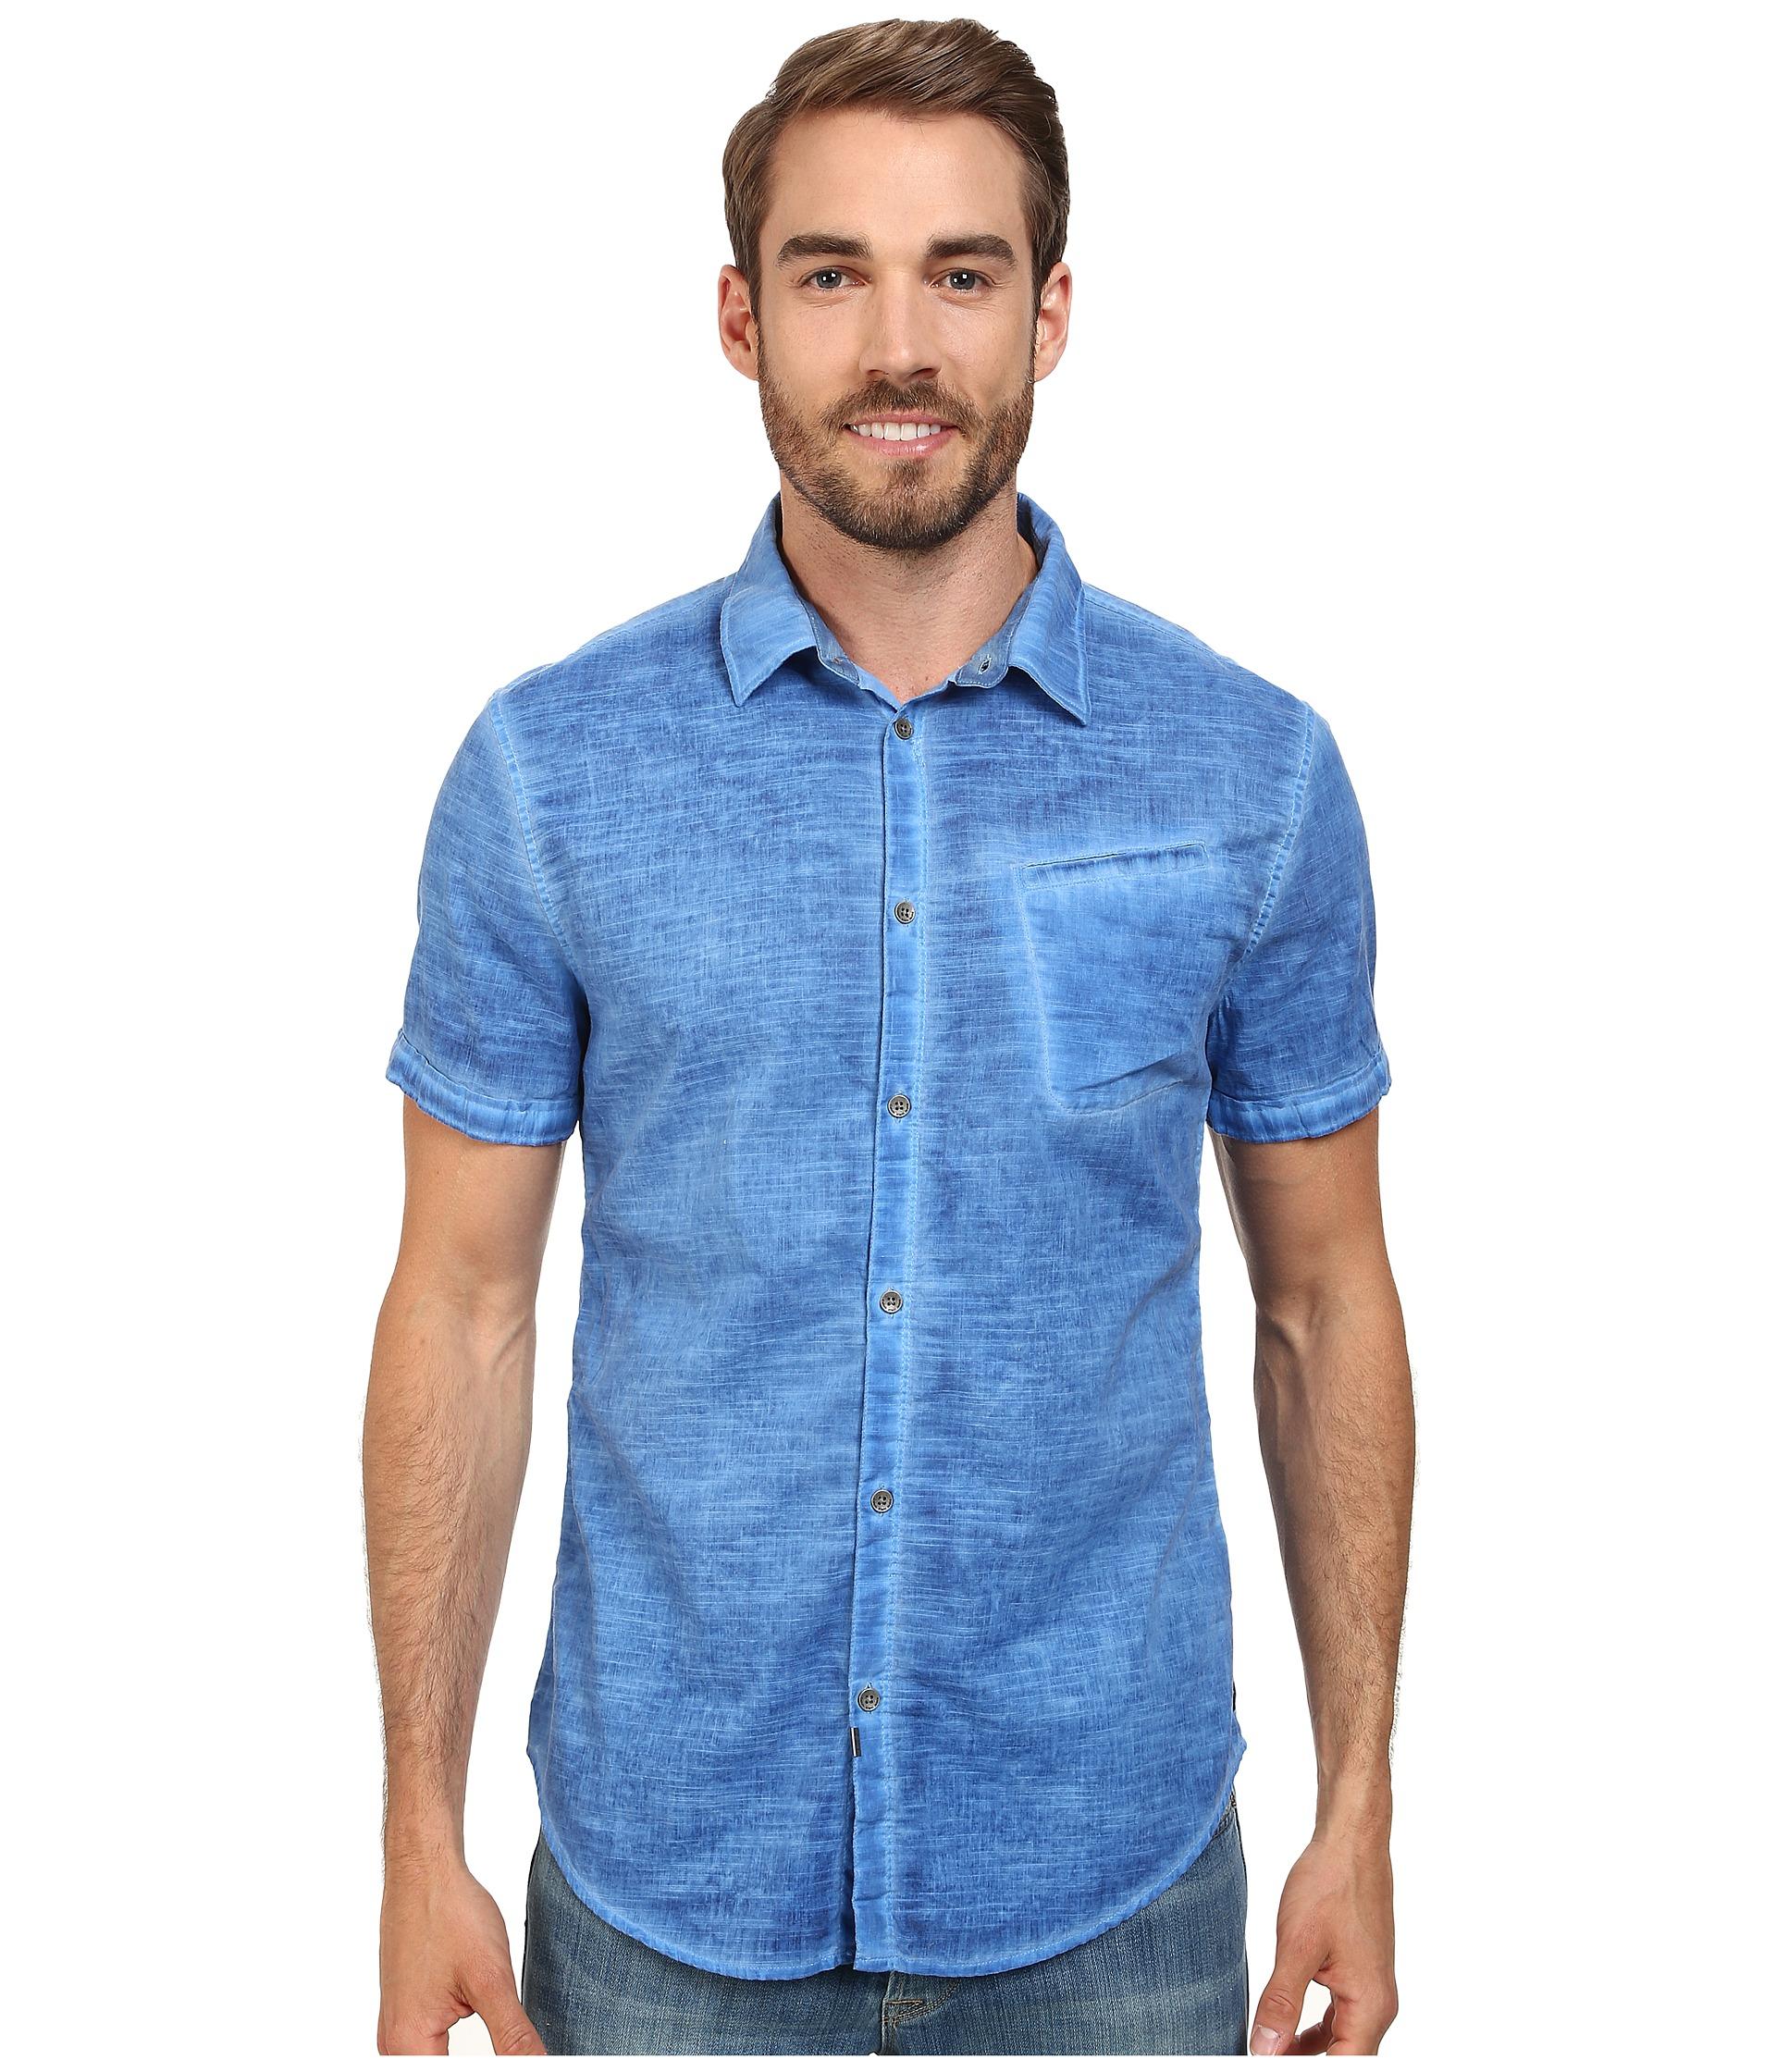 calvin klein jeans cold pigment dyed shirt in blue for men. Black Bedroom Furniture Sets. Home Design Ideas